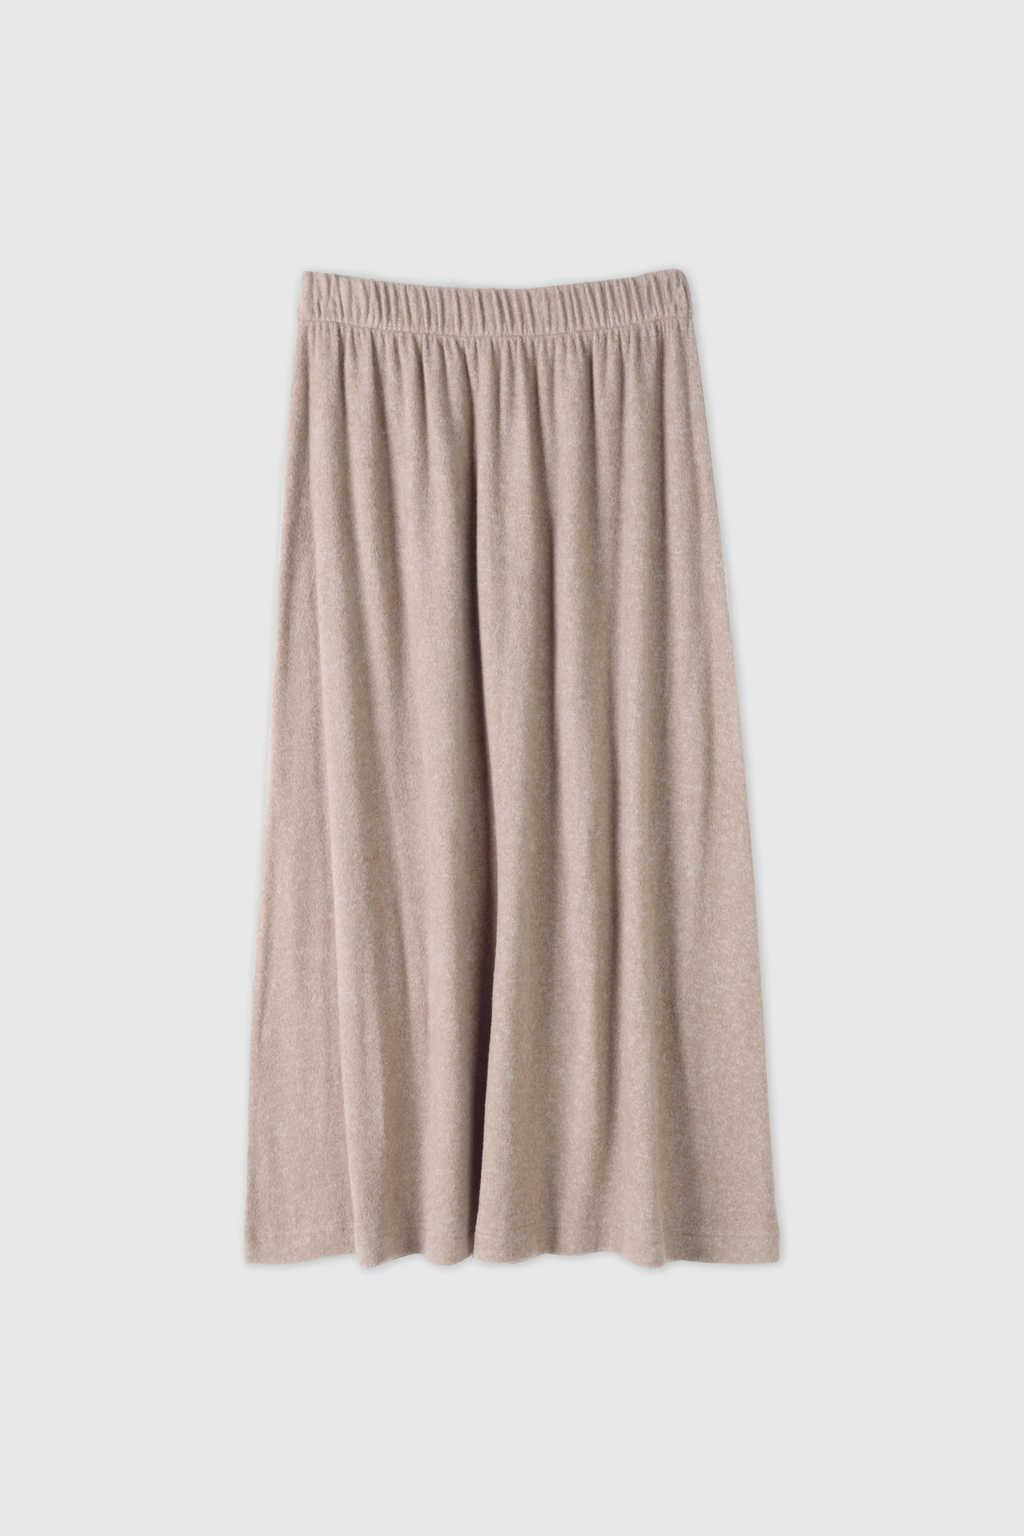 Skirt 2701 Oatmeal 7